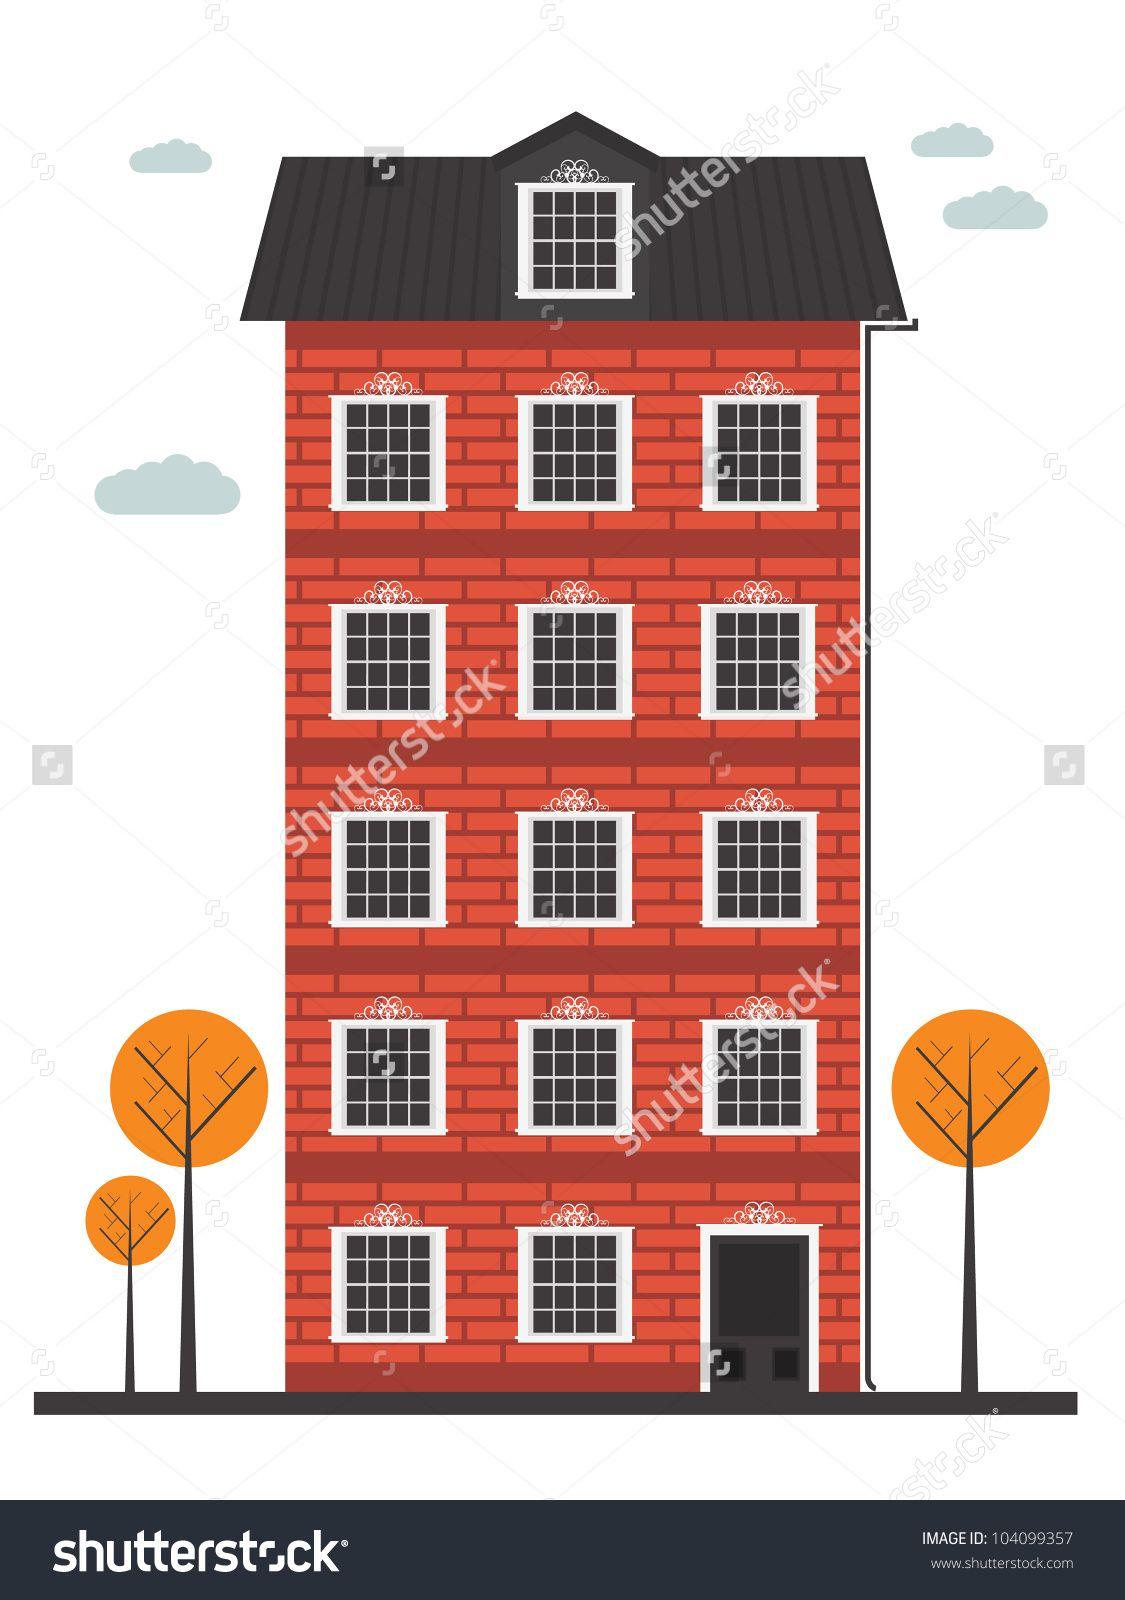 cartoon building google 2d pinterest image vector. Black Bedroom Furniture Sets. Home Design Ideas